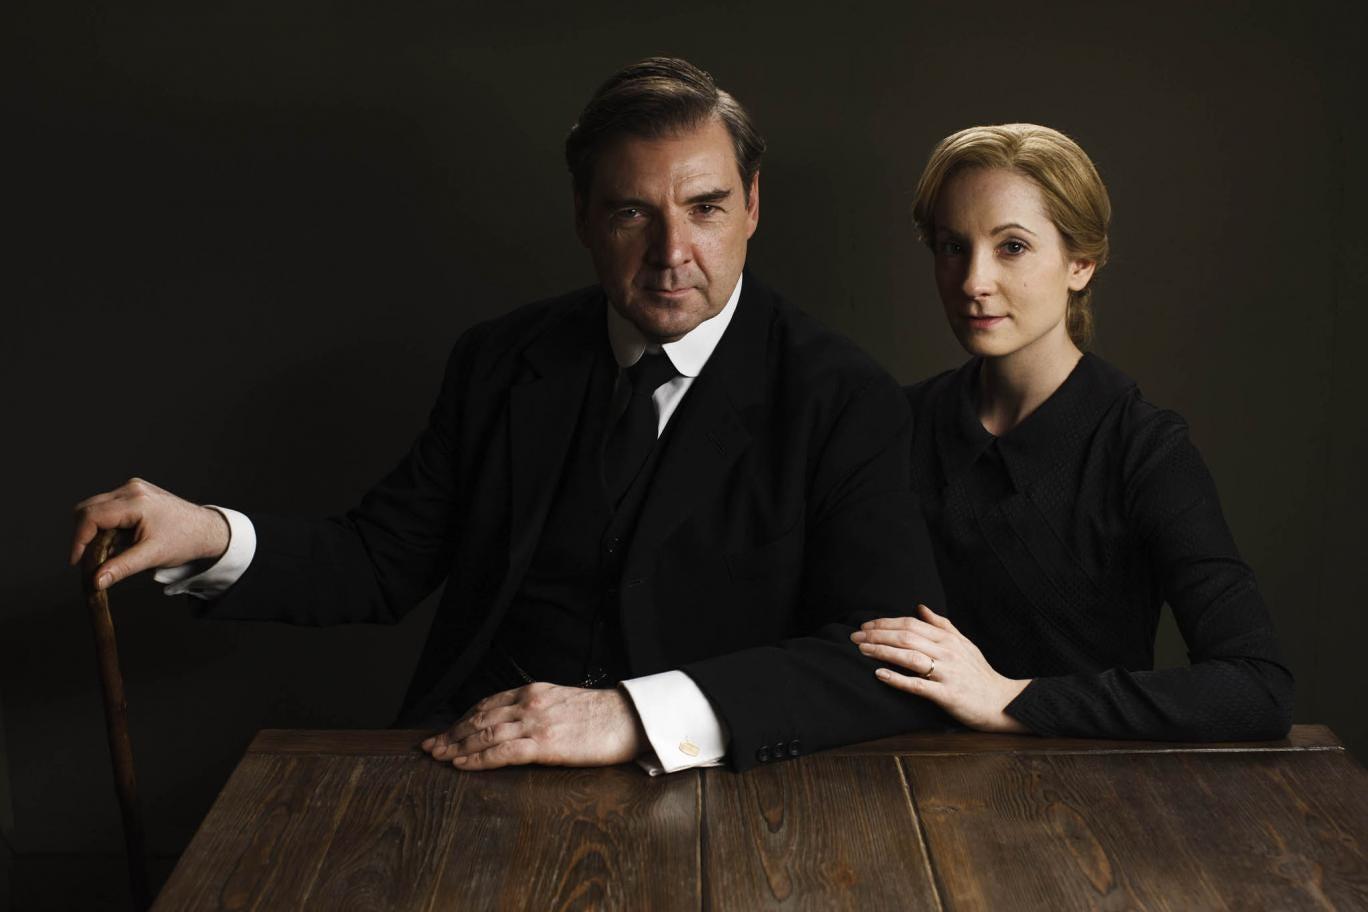 Elizabeth McGovern as Cora, Countess of Grantham and Richard E Grant as Simon Bricker